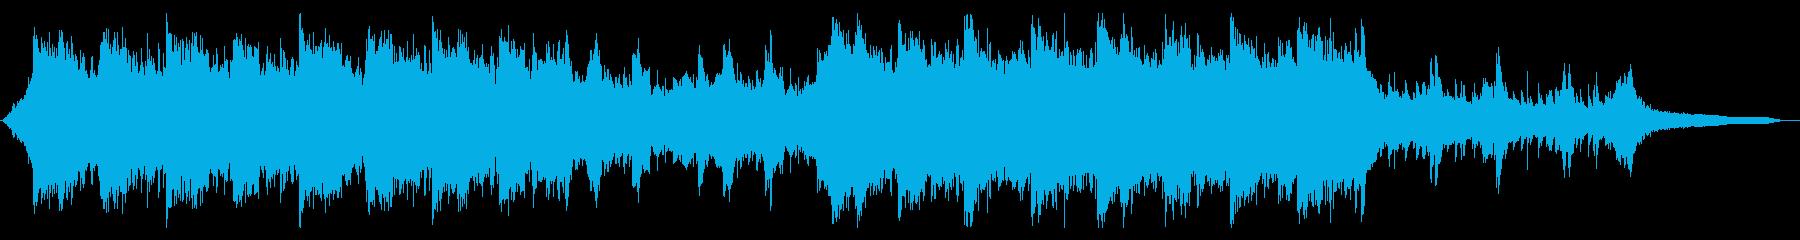 texture21の再生済みの波形